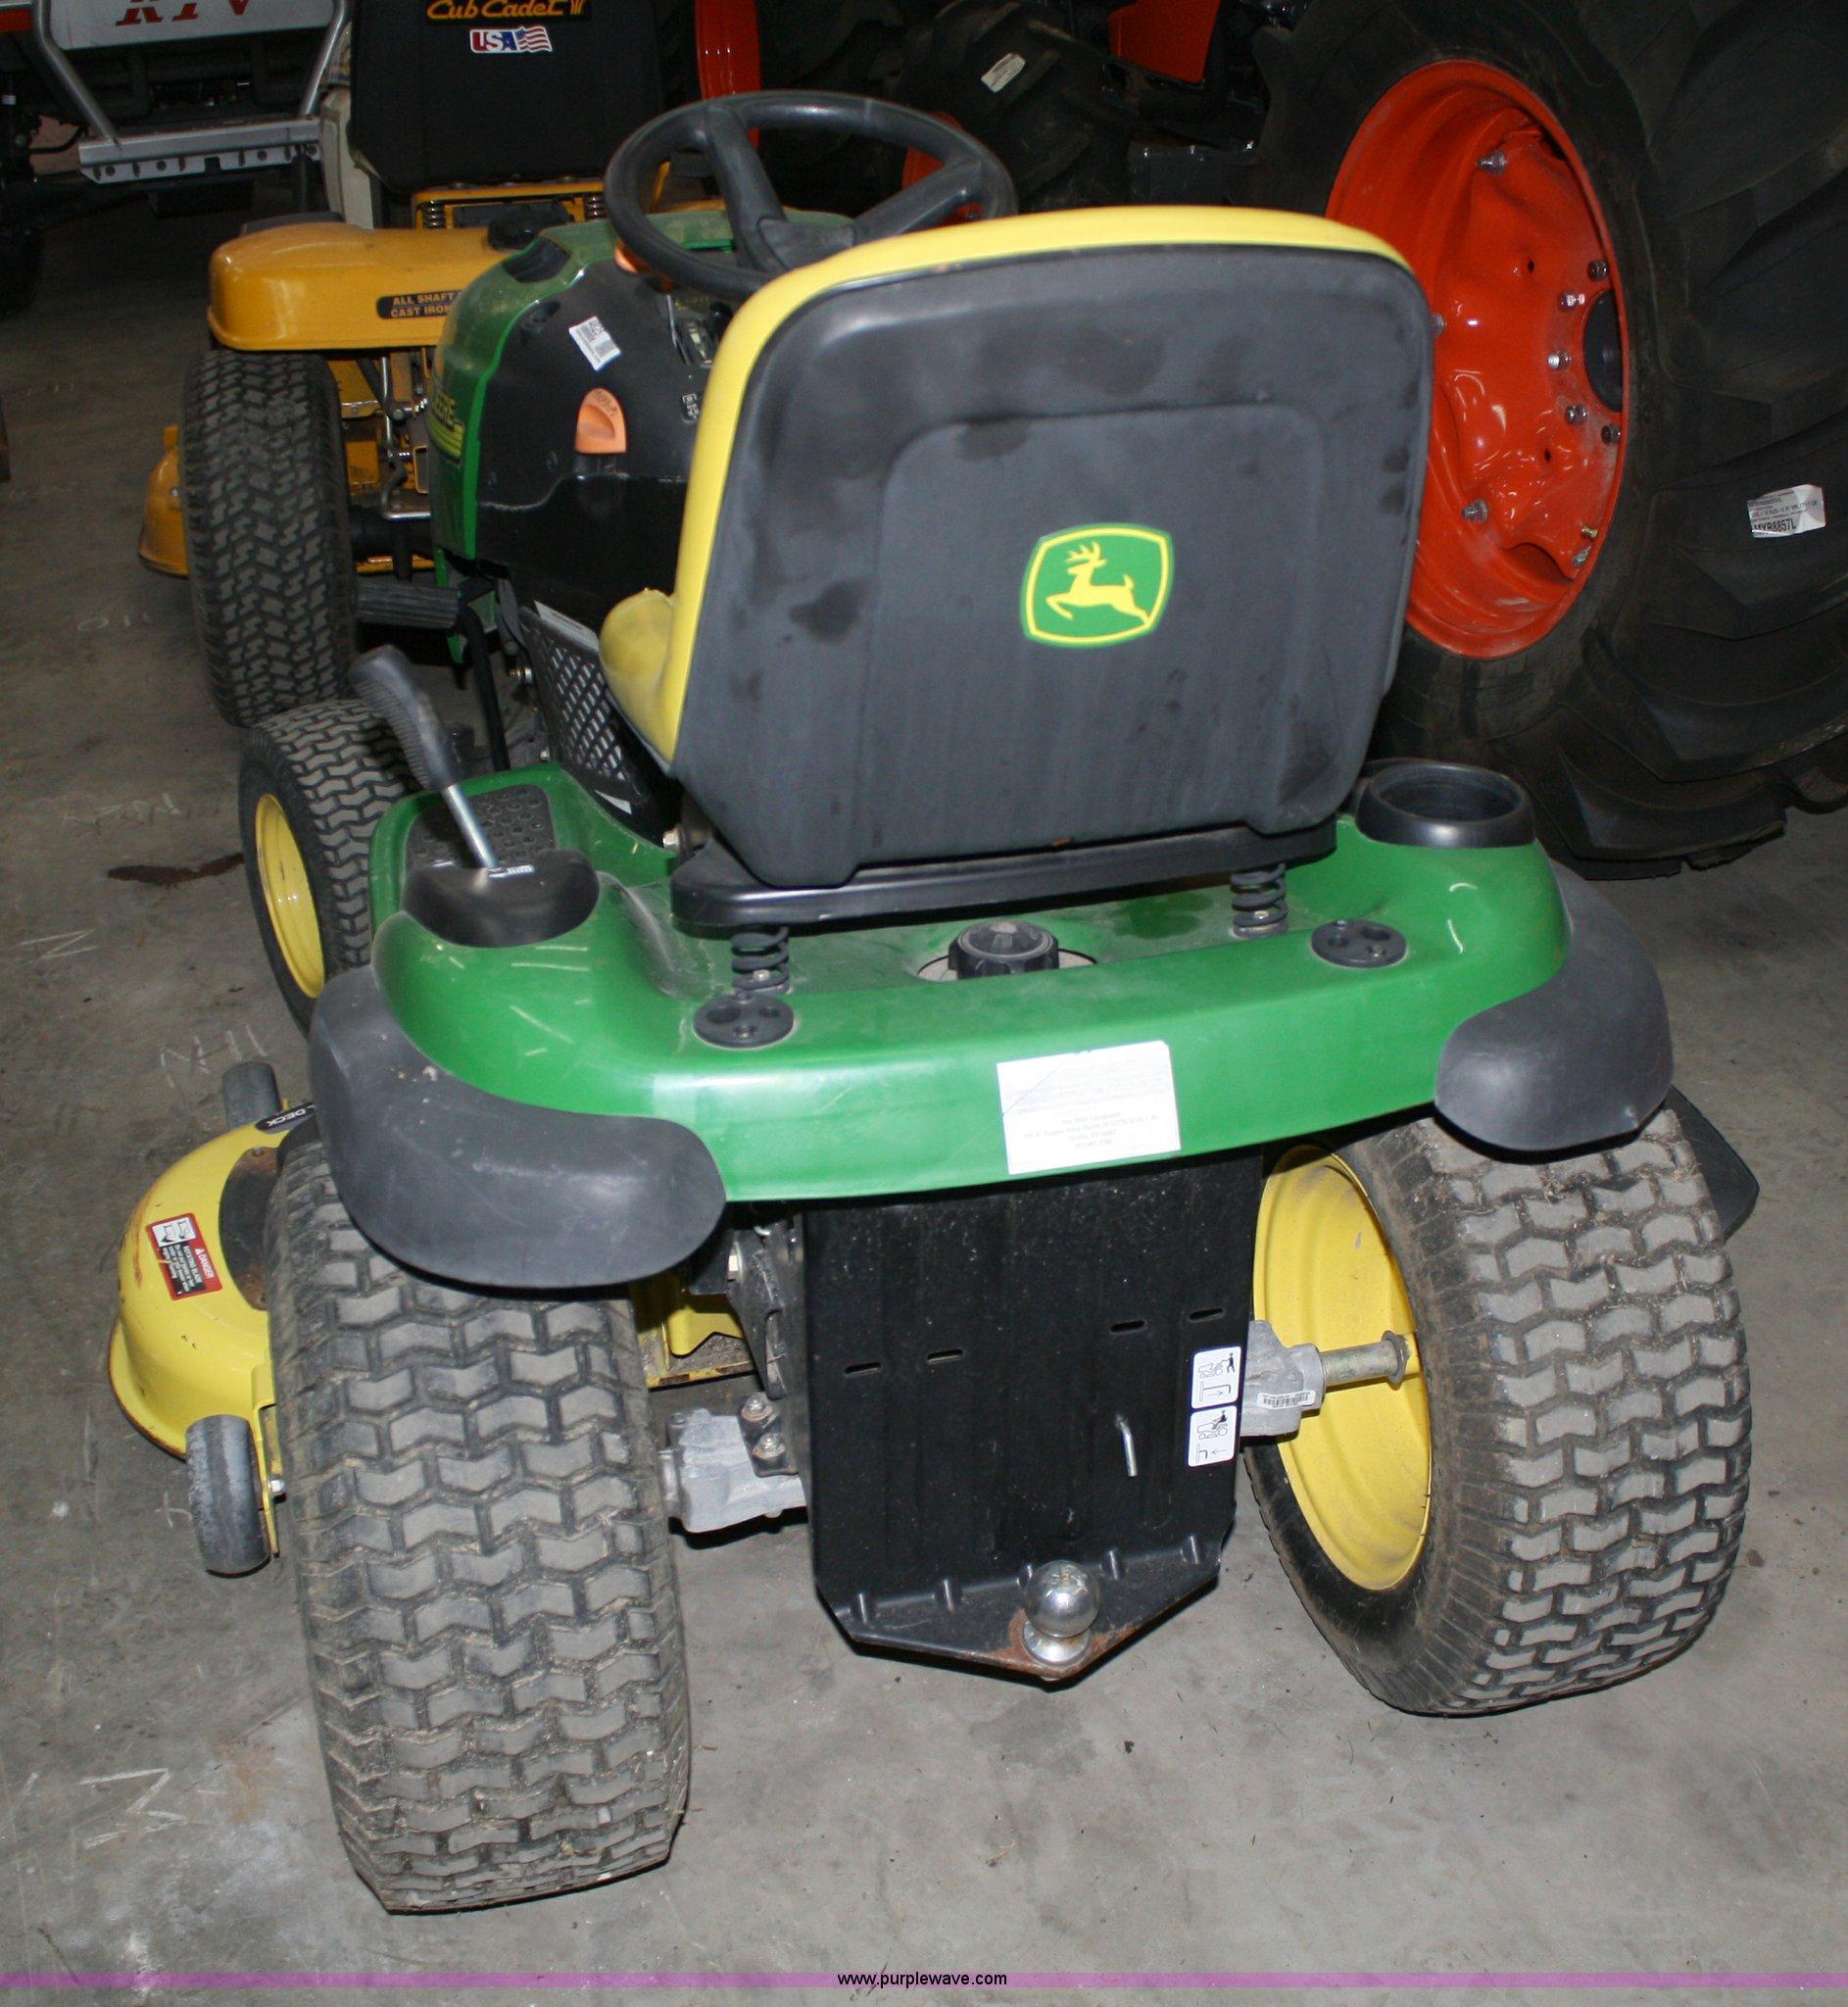 2004 John Deere L120 Lawn Mower Item 4825 Sold